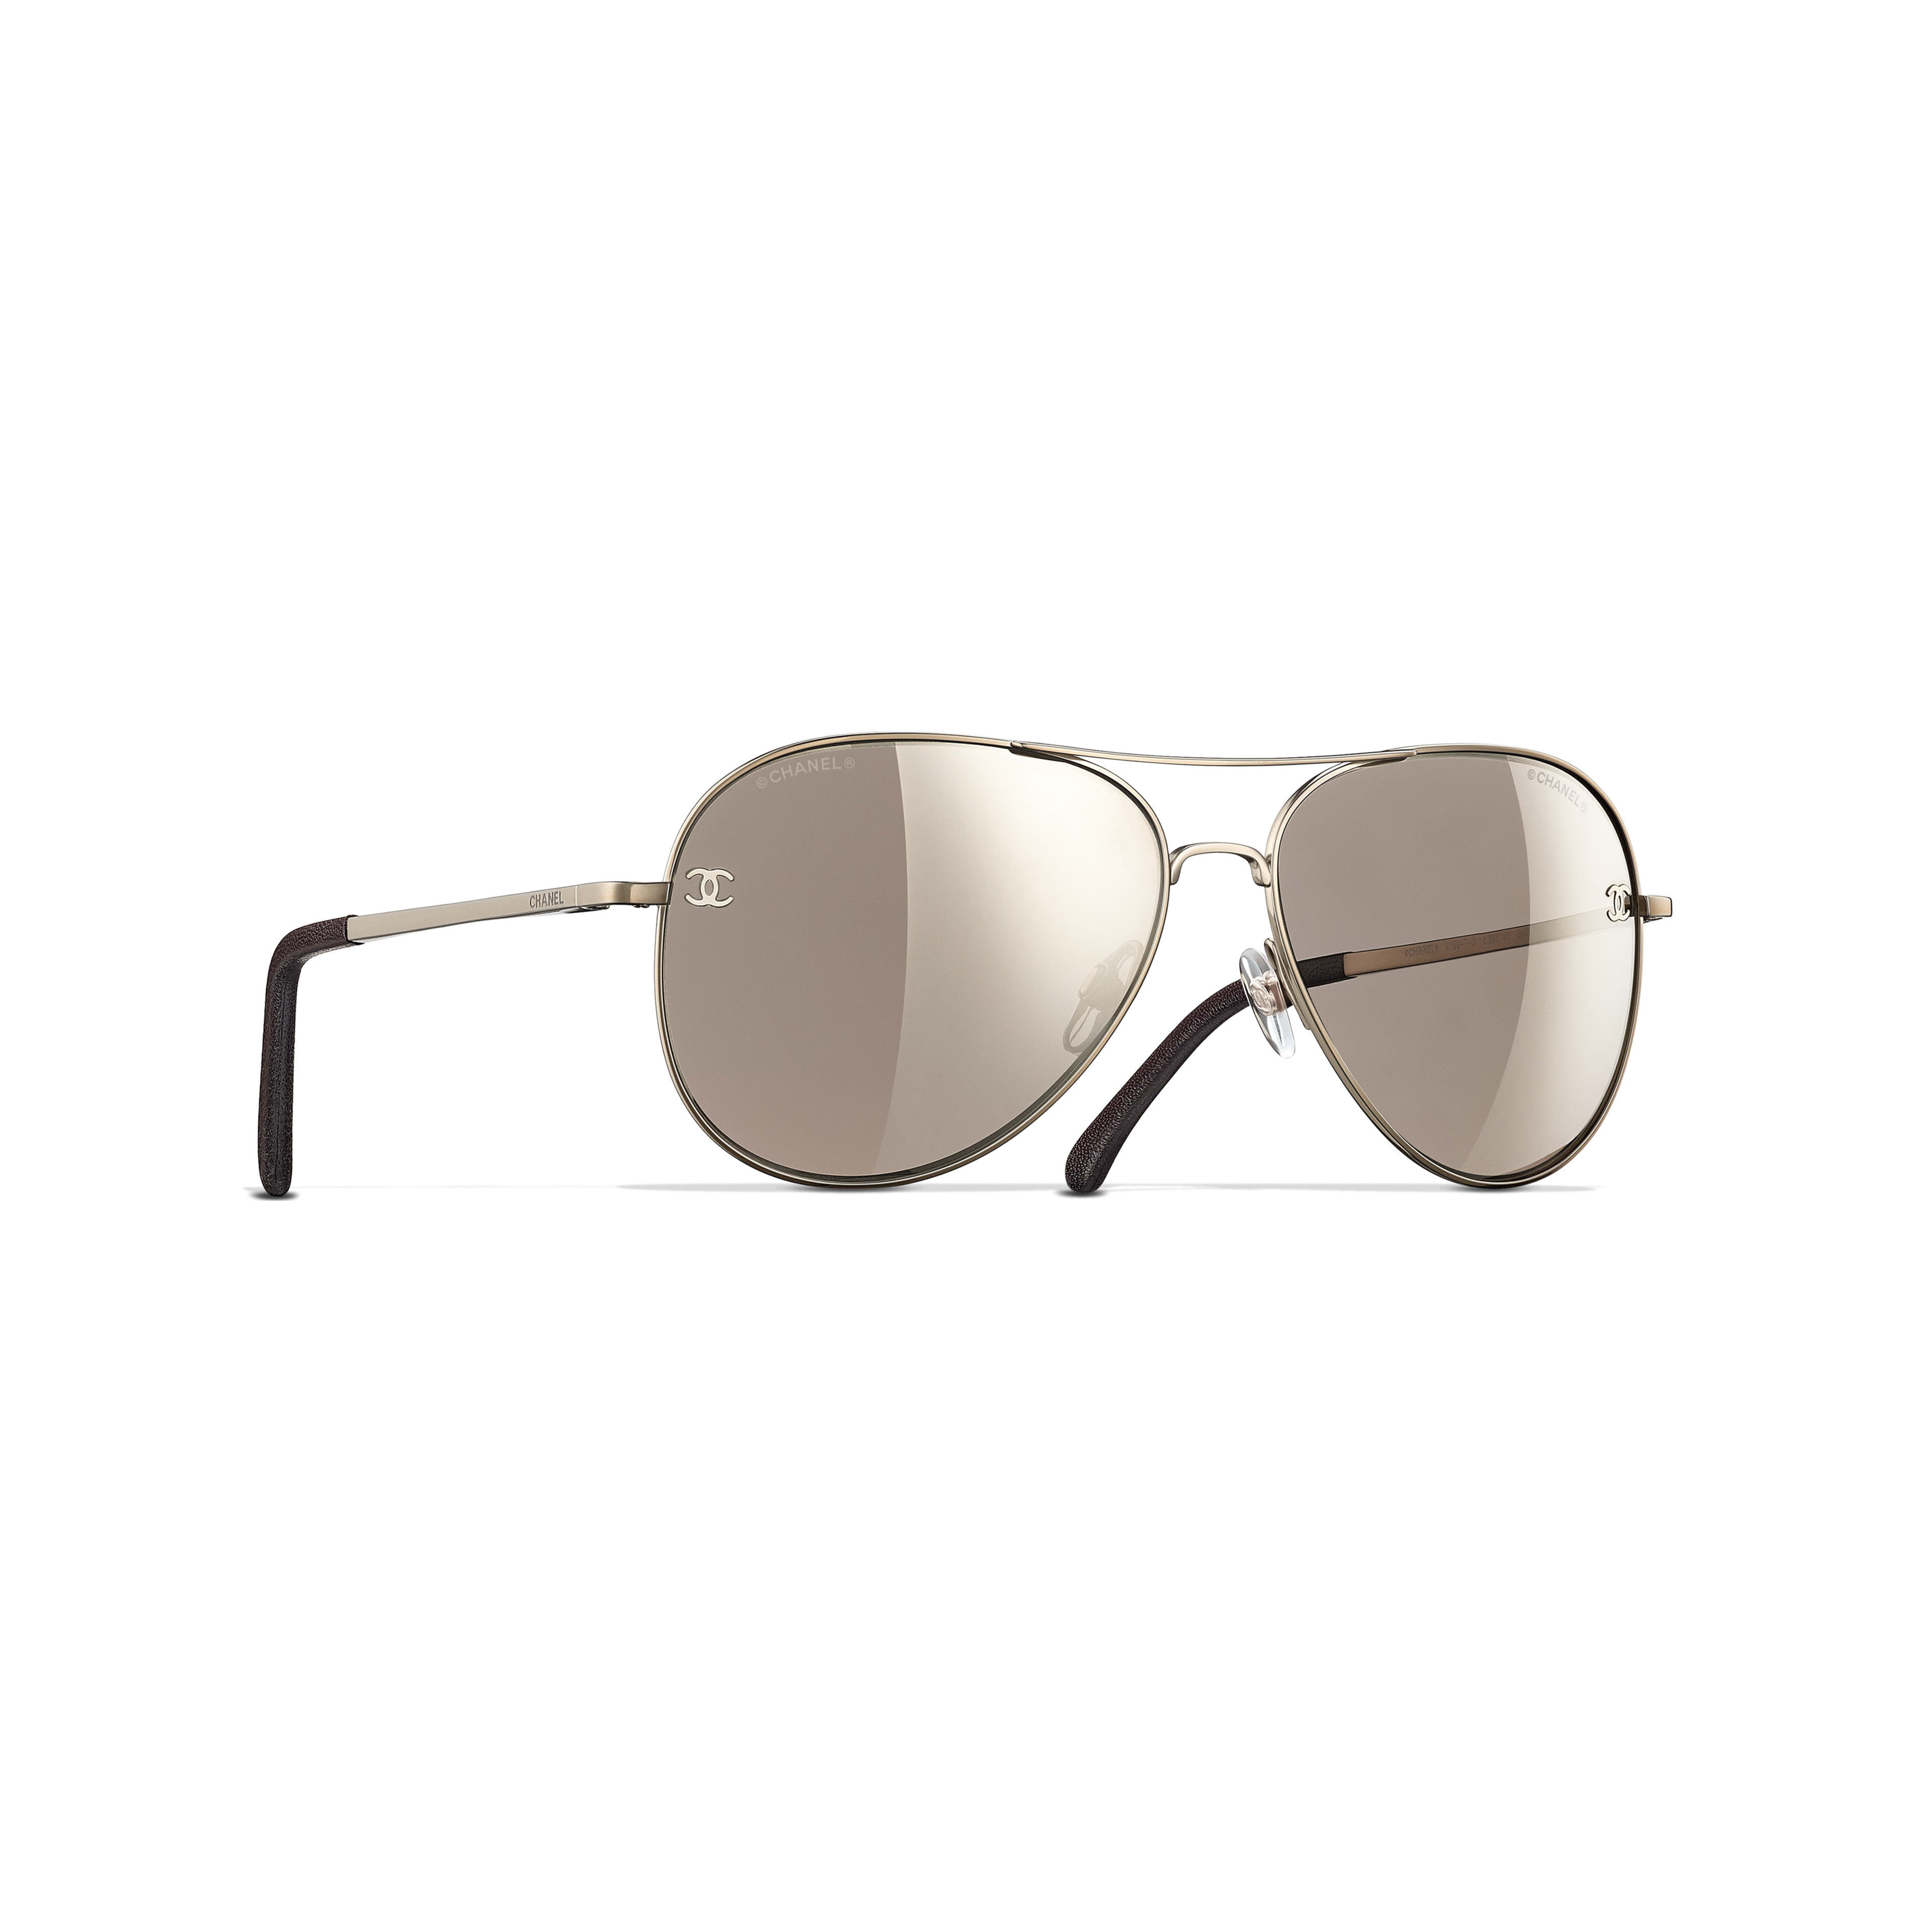 Pilot Sunglasses - Gold & Brown - Titanium & Calfskin - CHANEL - Default view - see standard sized version